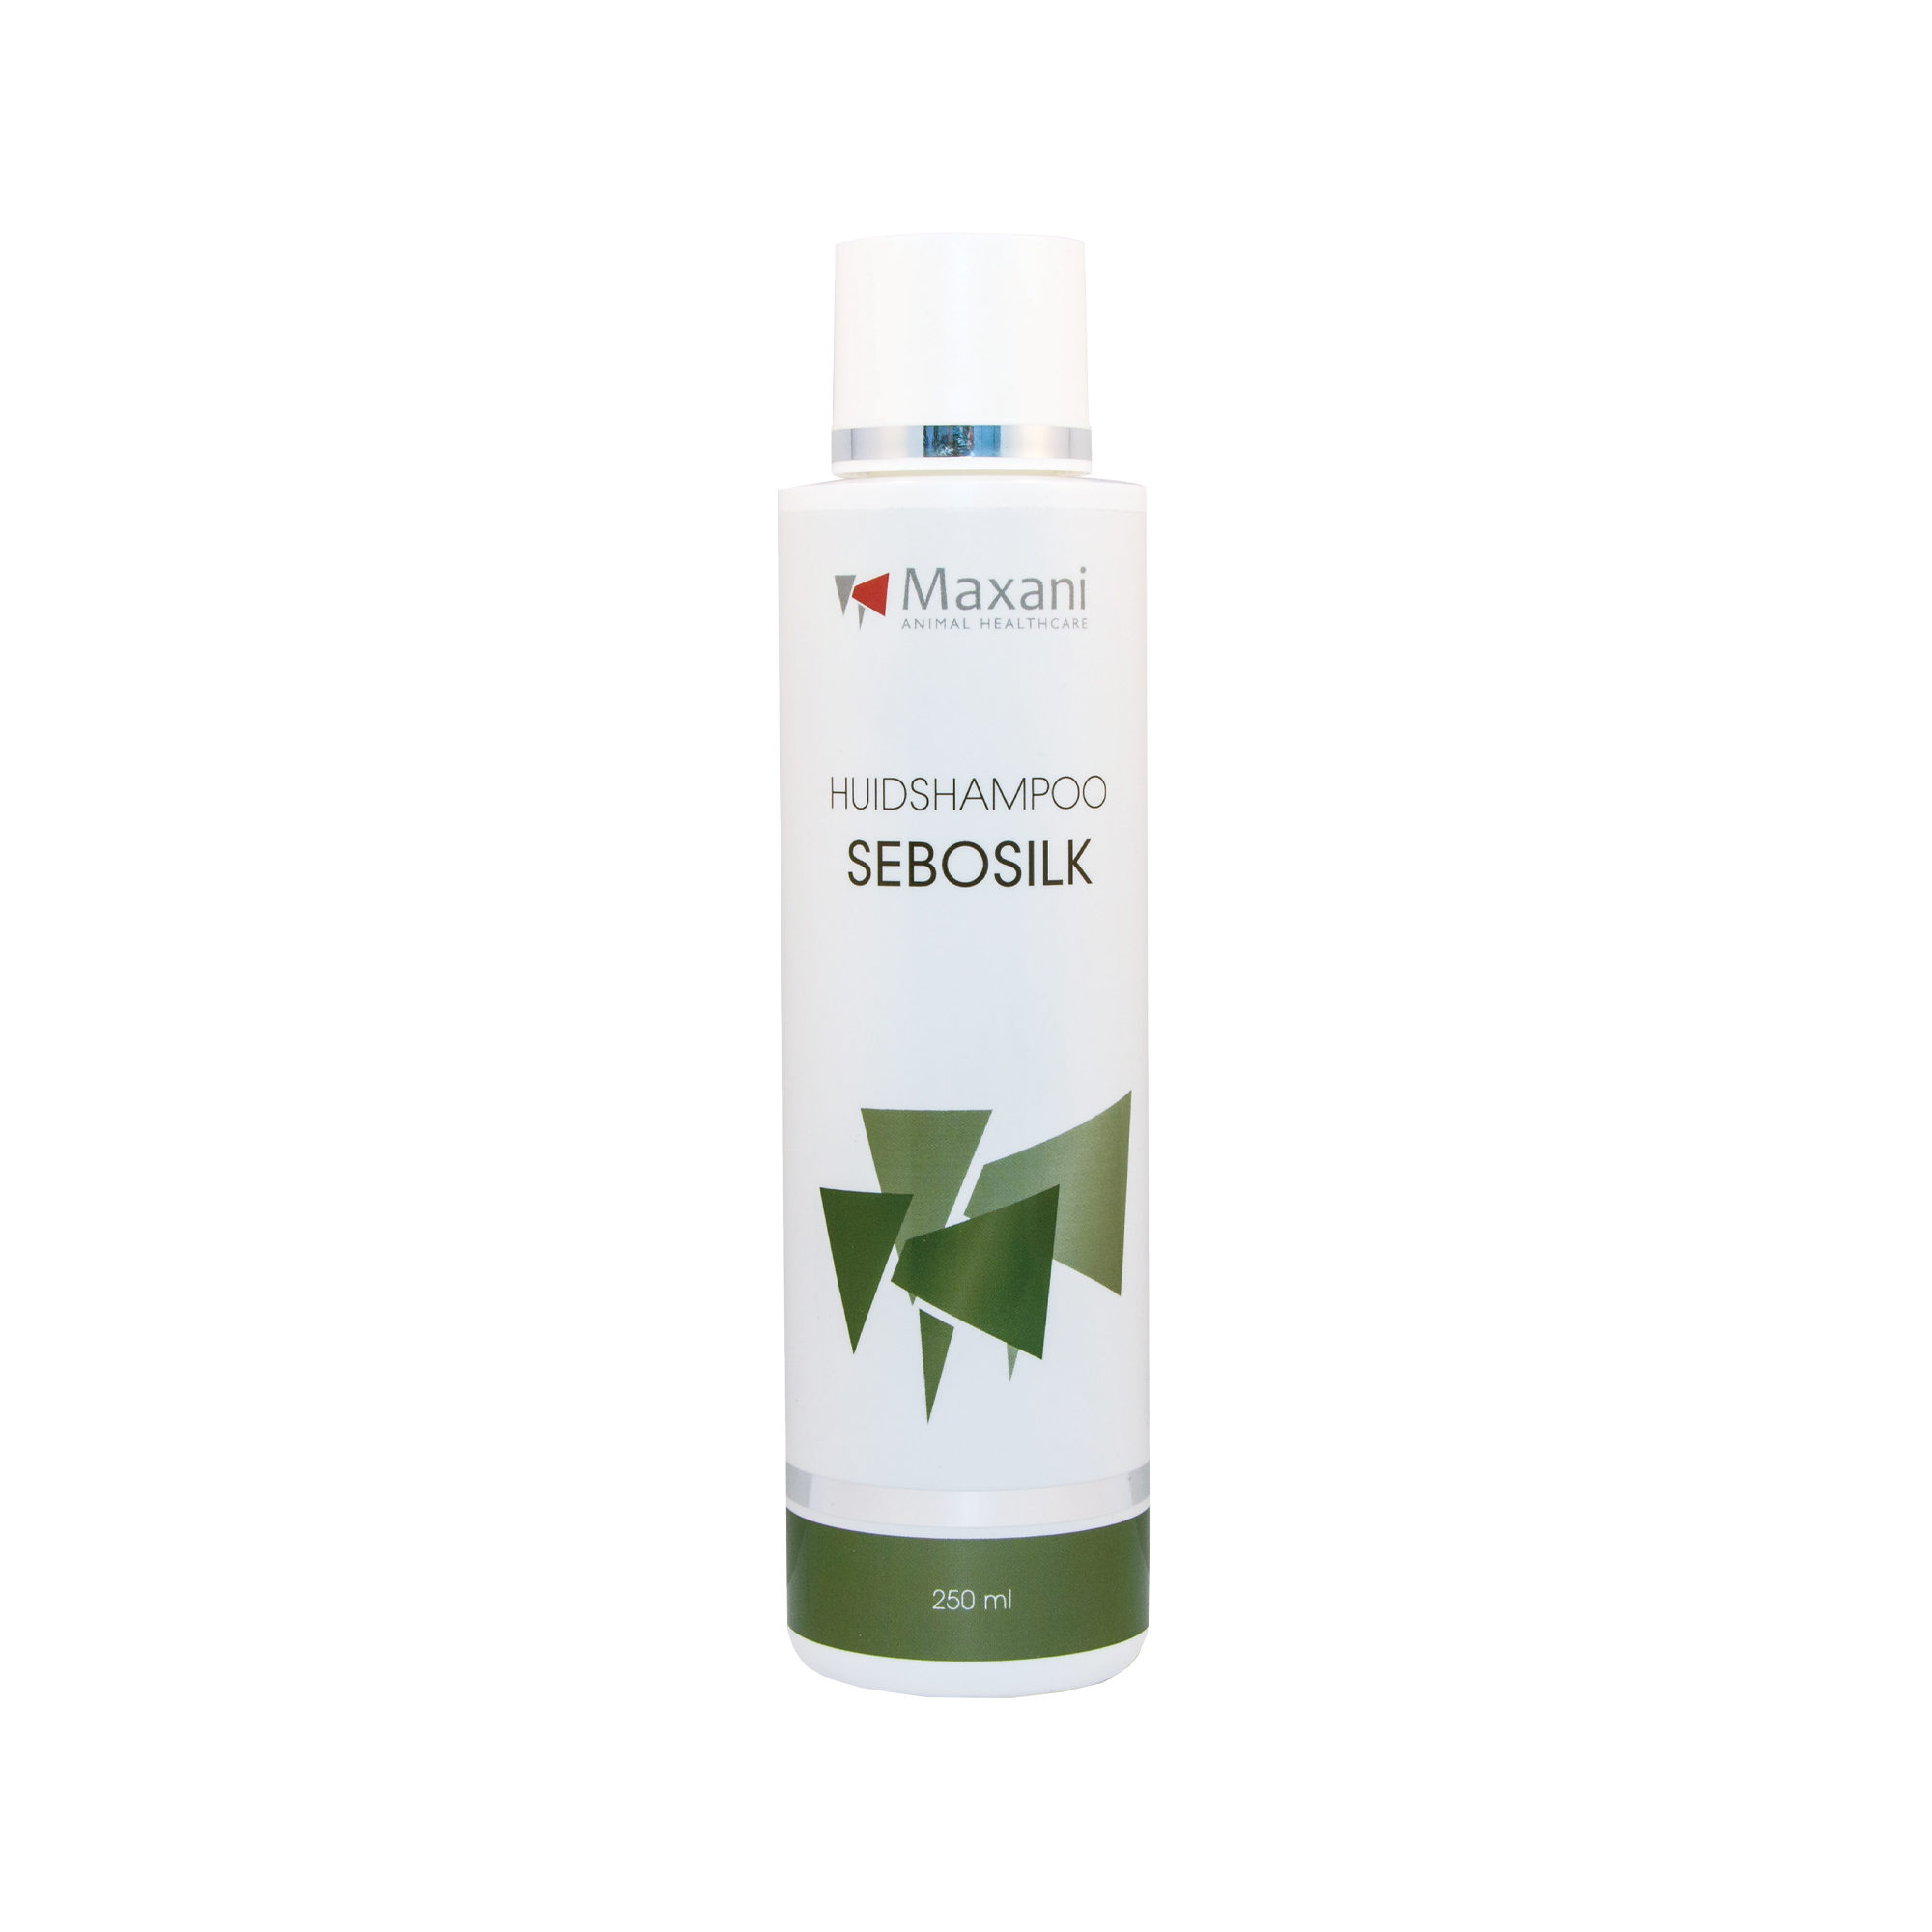 Maxani SeboSilk Shampoo